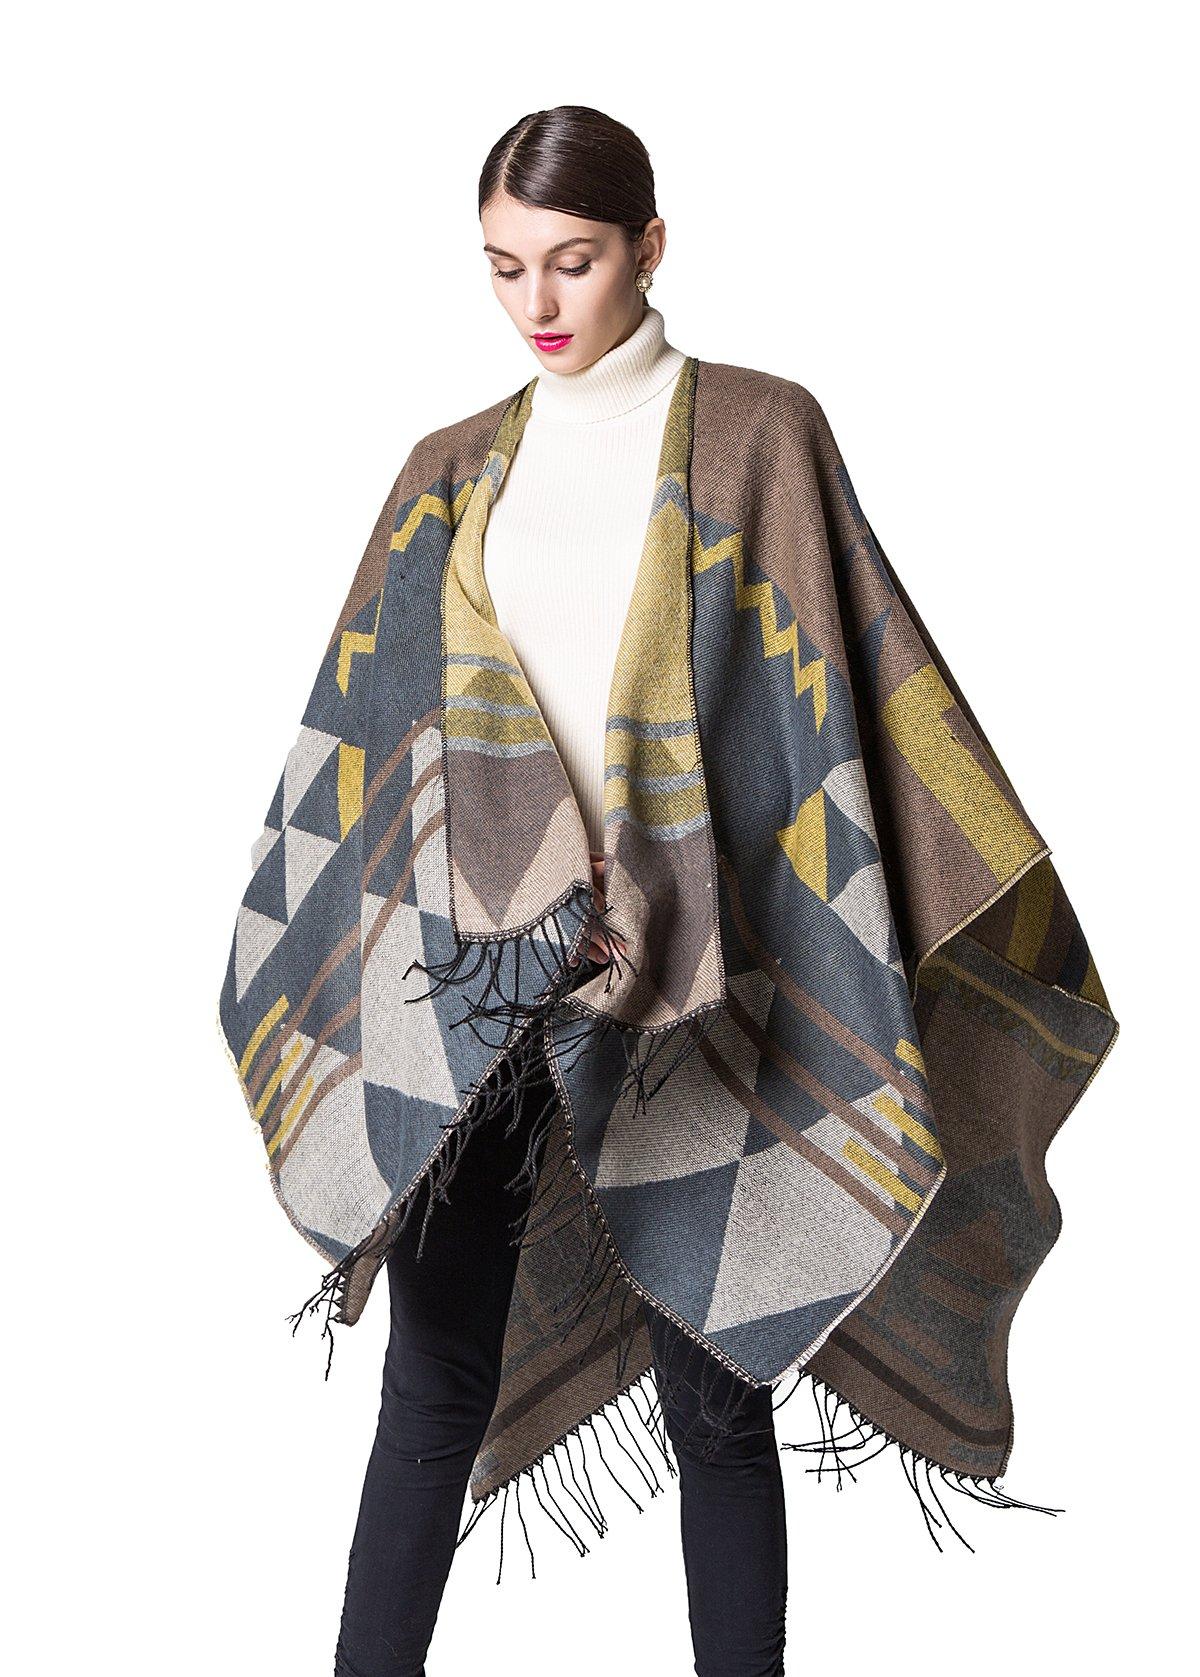 JURUAA Plus Size Knitted Poncho Sweater Shawls Wraps Cape Ruana Coat Yellow